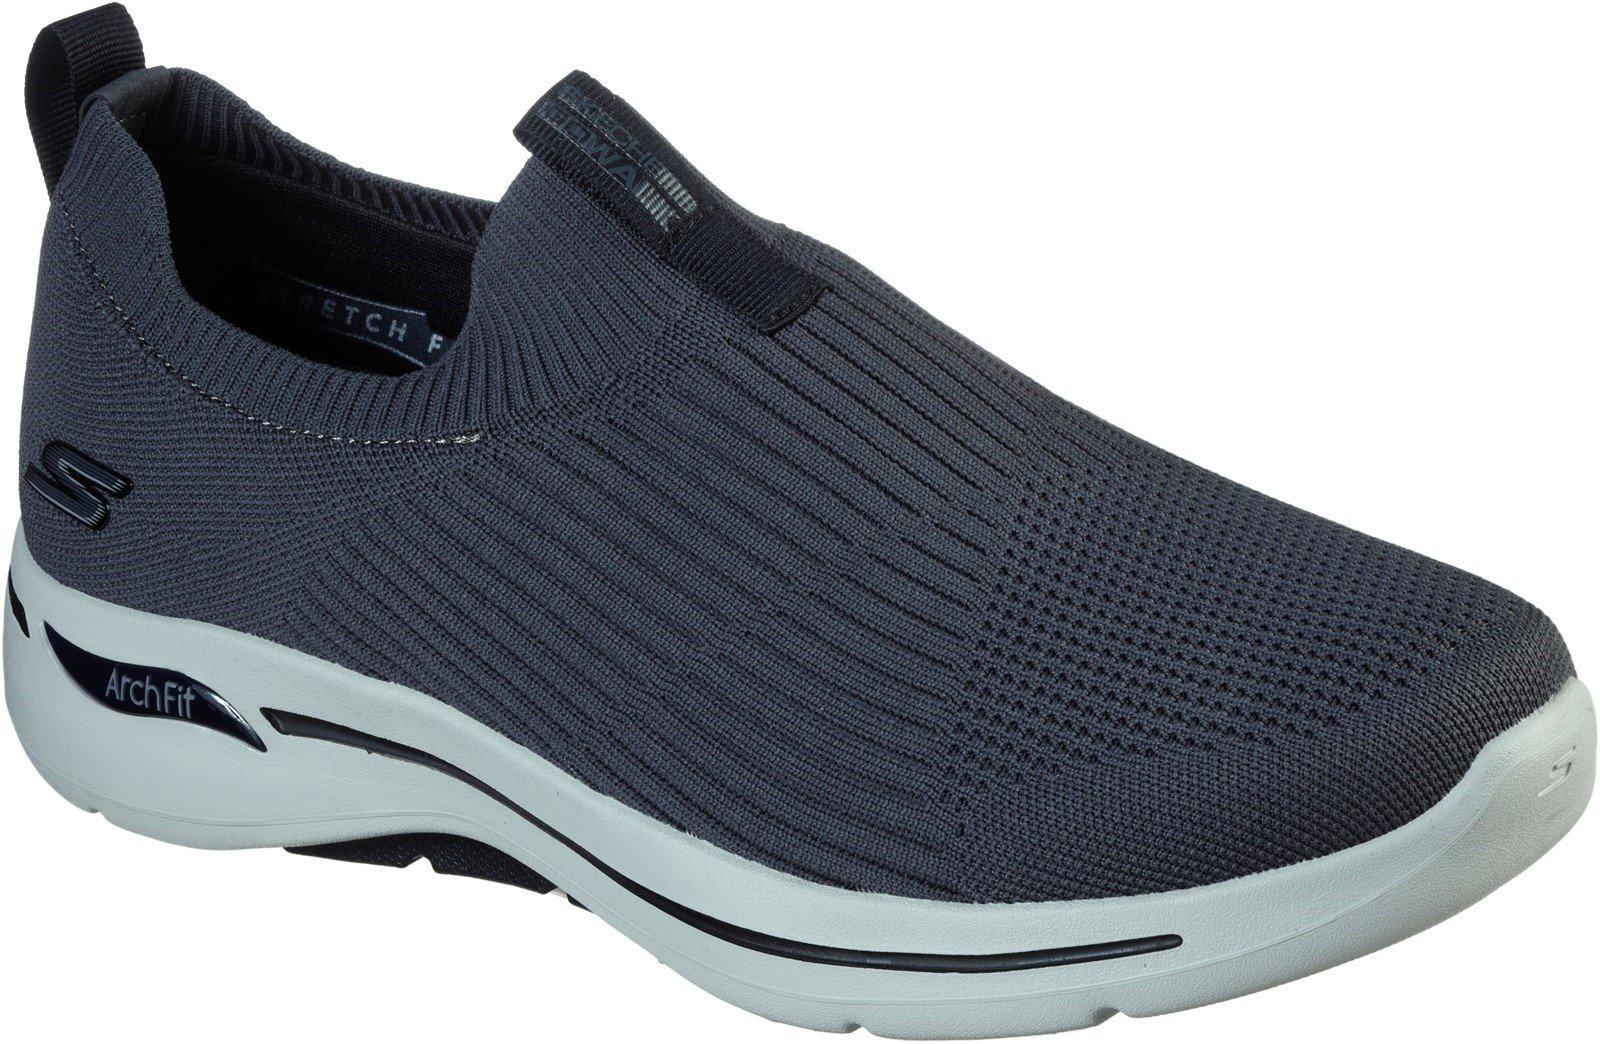 Skechers Men's Go Walk Arch Fit Slip On Trainer Various Colours 32203 - Charcoal/Black 6